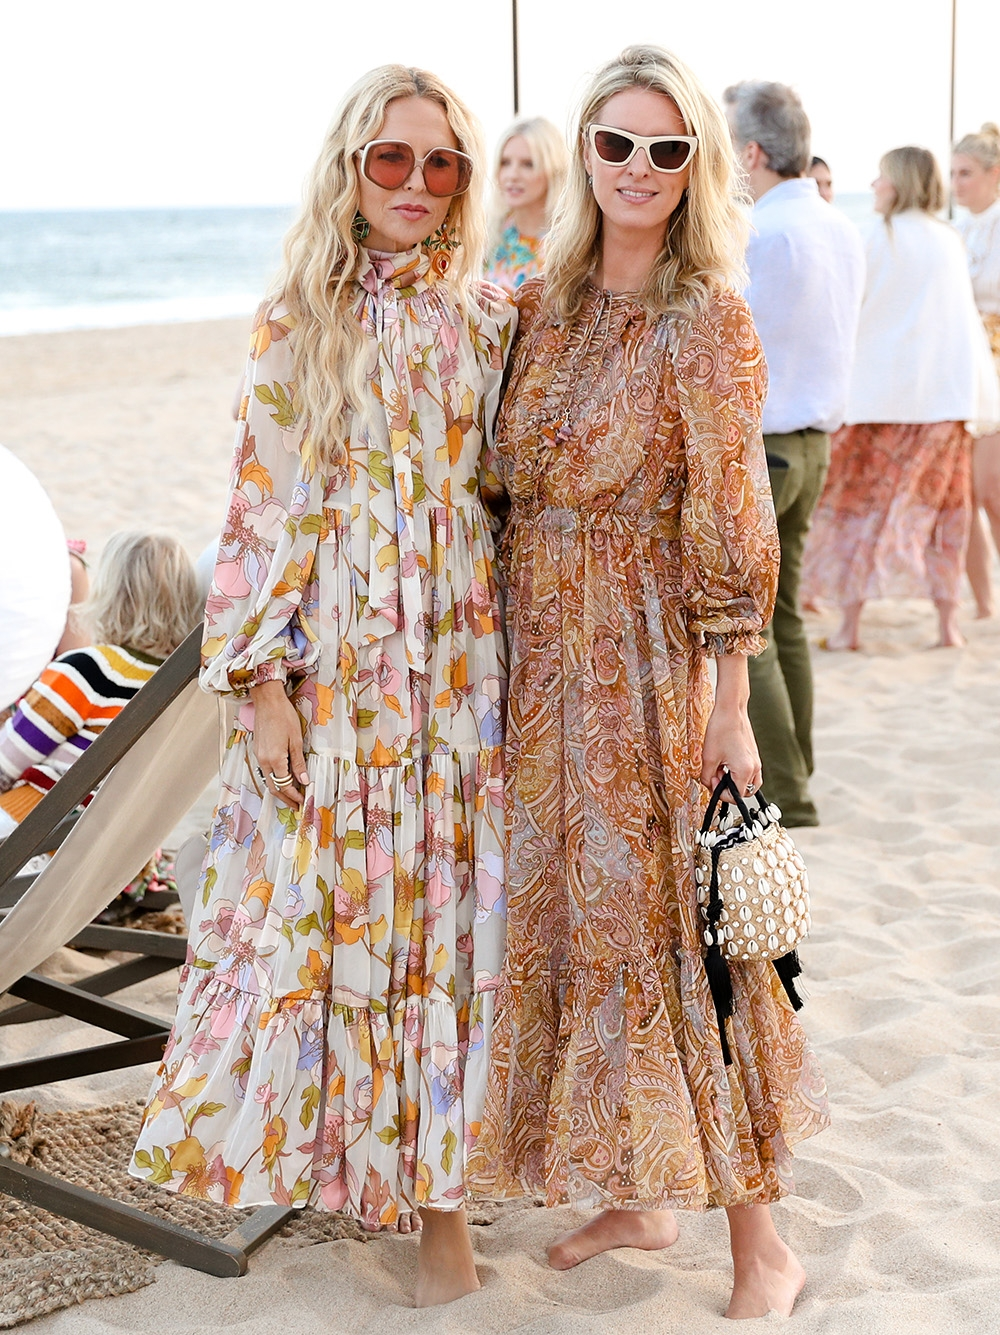 Rachel Zoe and Nicky Hilton at our Hamptons Summer Dinner